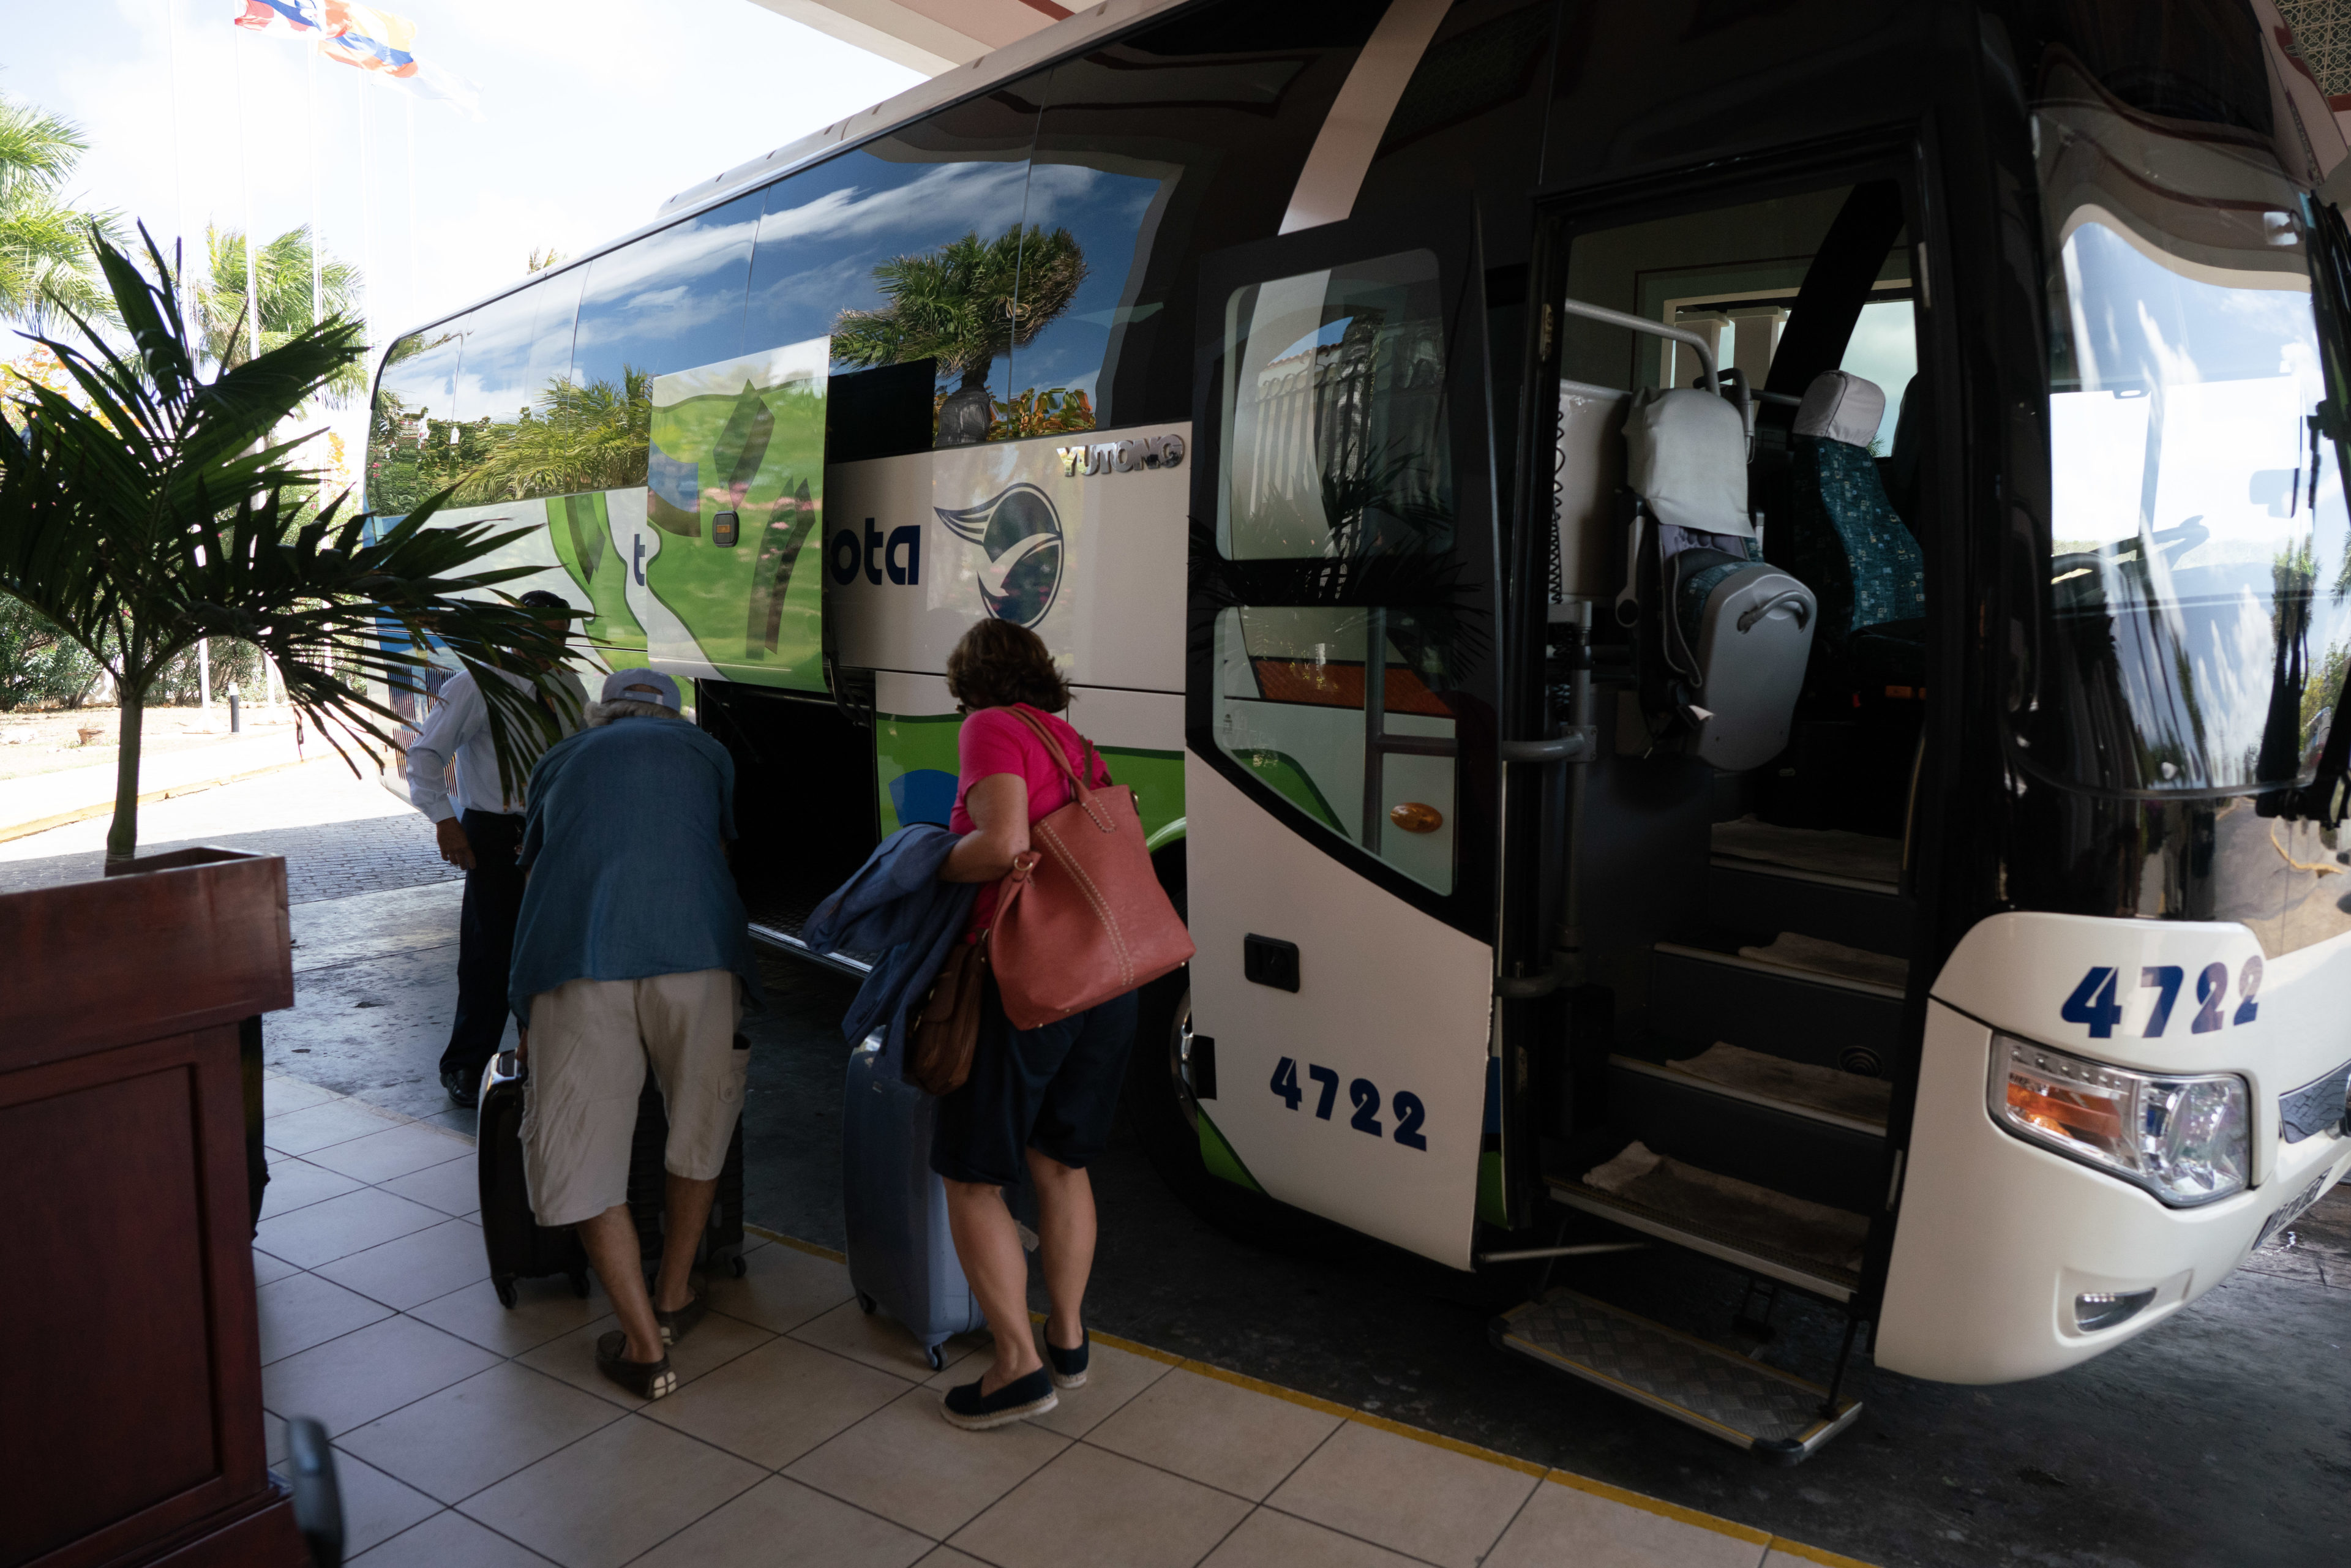 Reisender packen Gepäck im Víazul Bus in Kuba